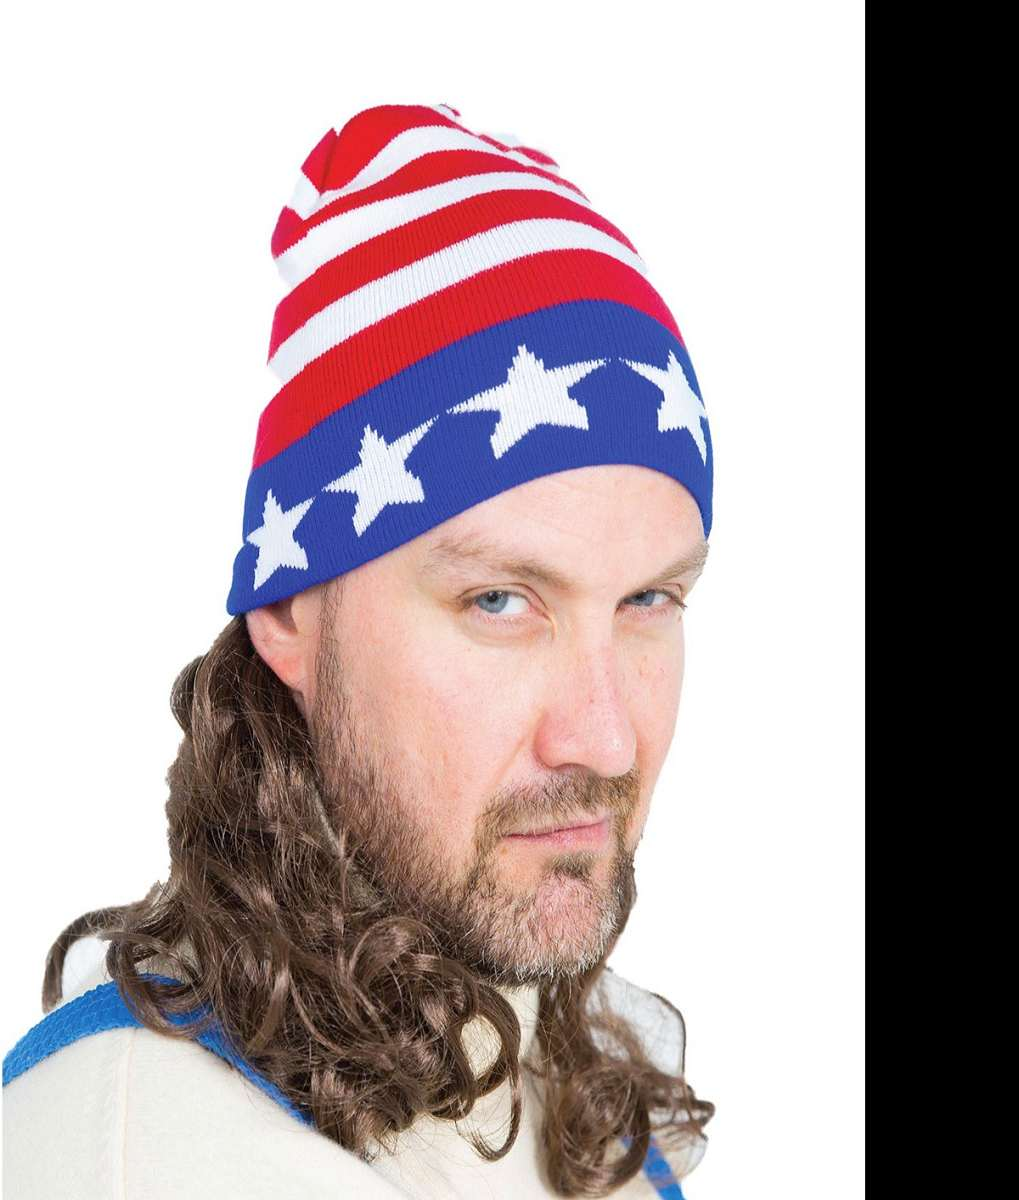 Mullet Headbands | DudeIWantThat.com